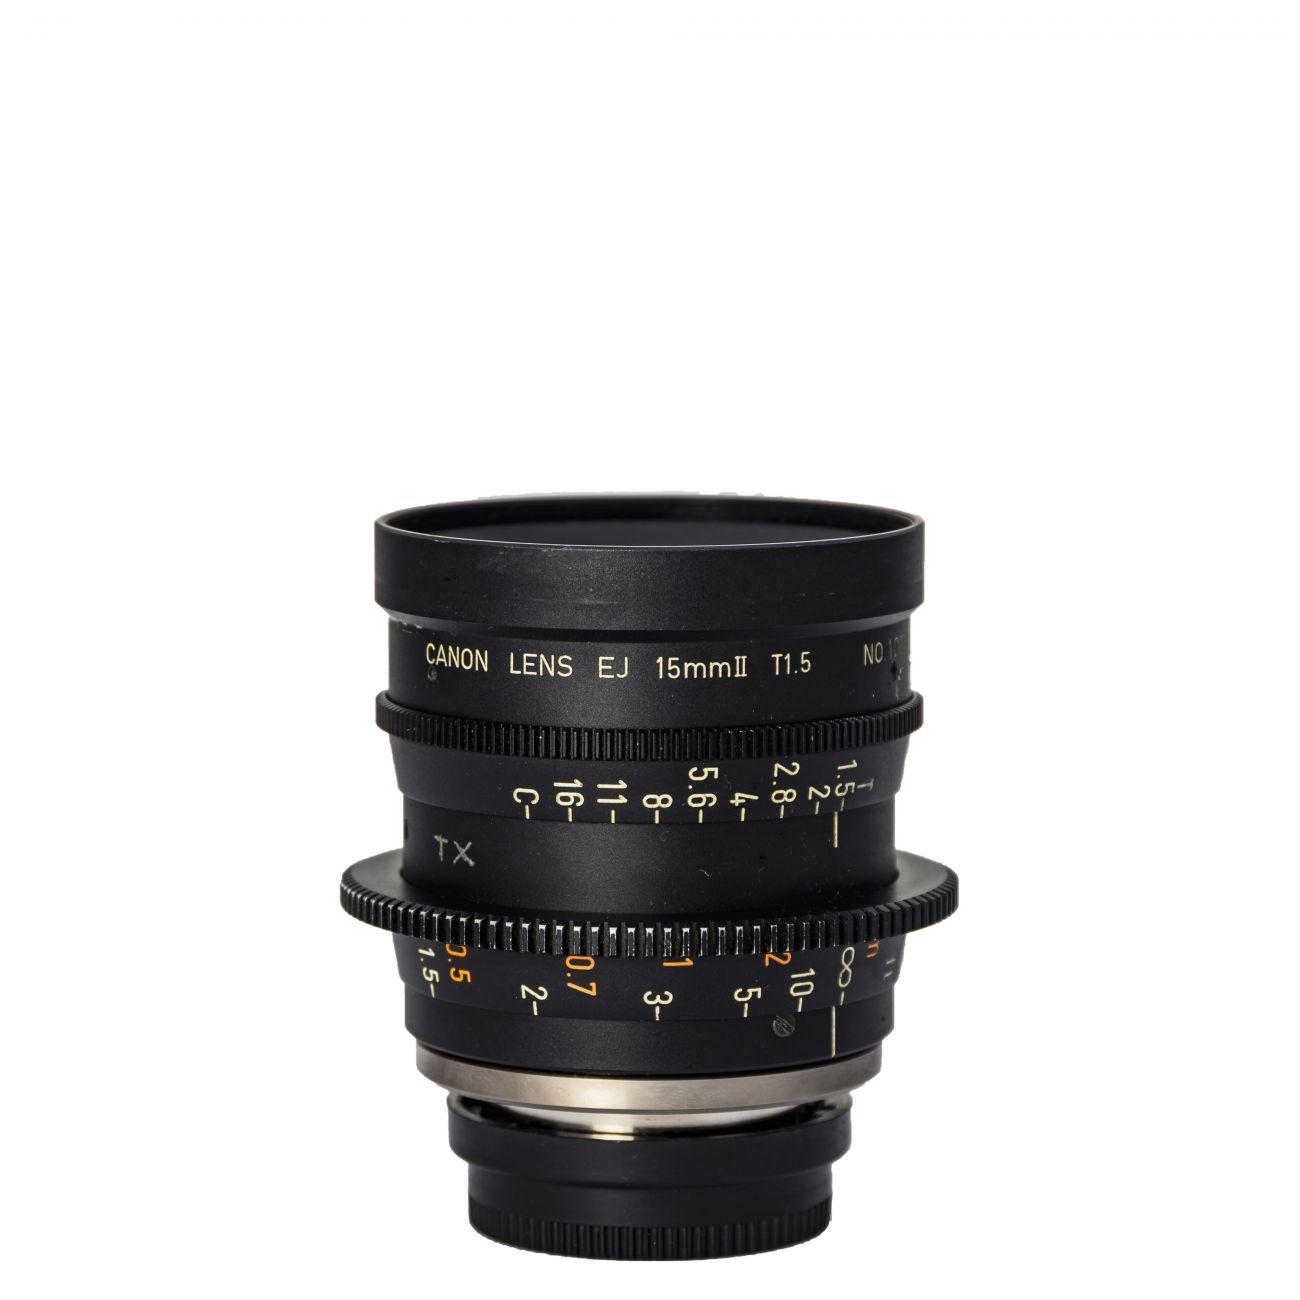 15mm lens Canon EJ T1.5 B4-mount